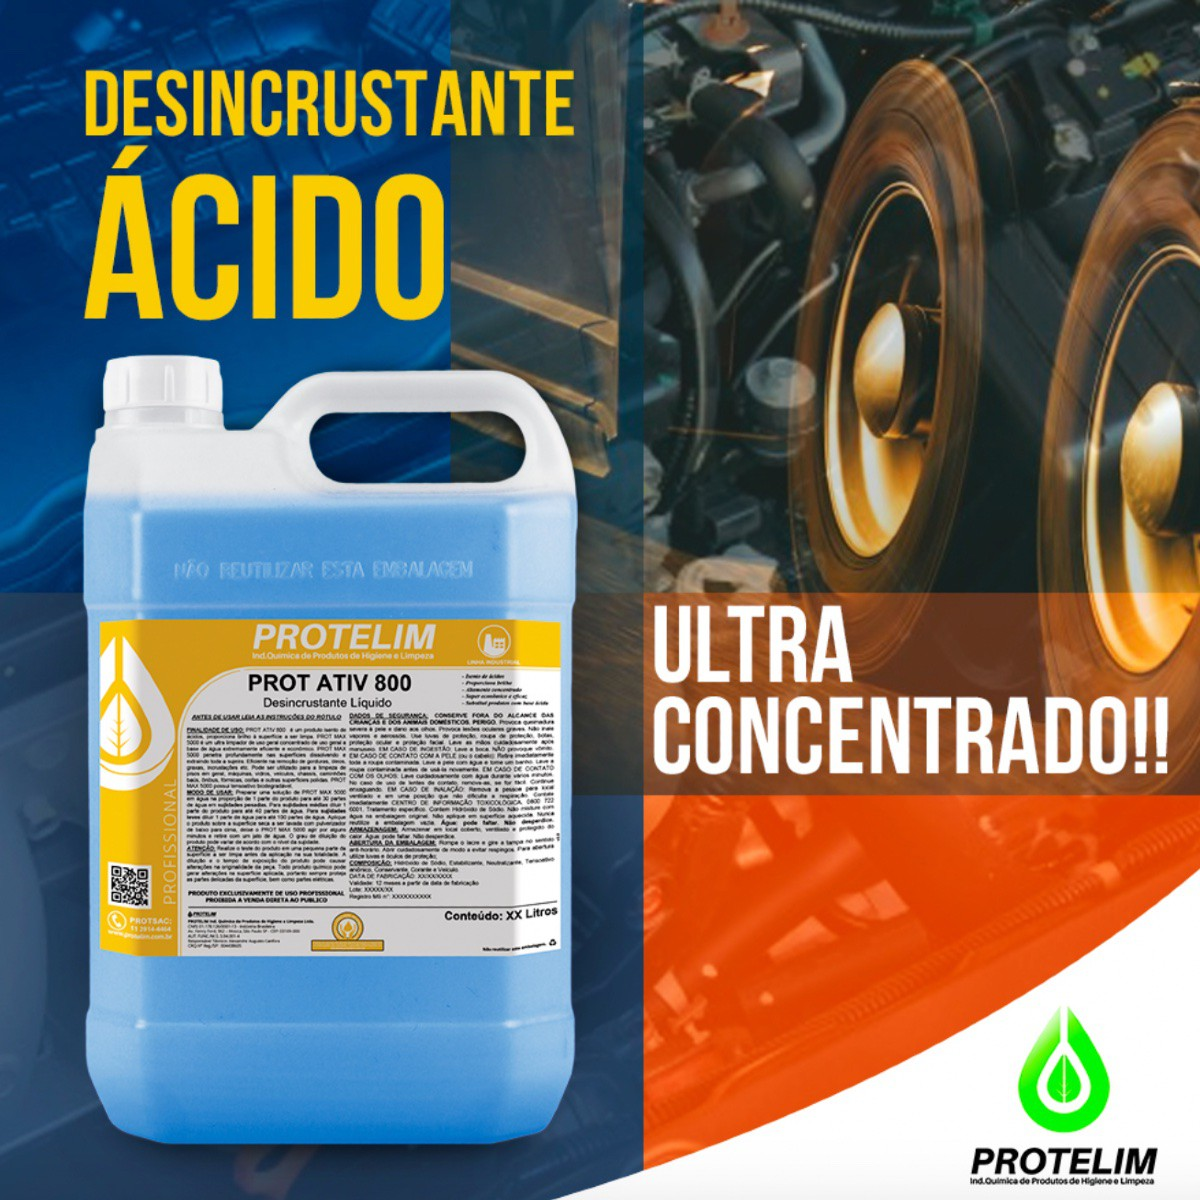 Detergente Desincrustante Limpa Baú Prot Ativ 800 5L